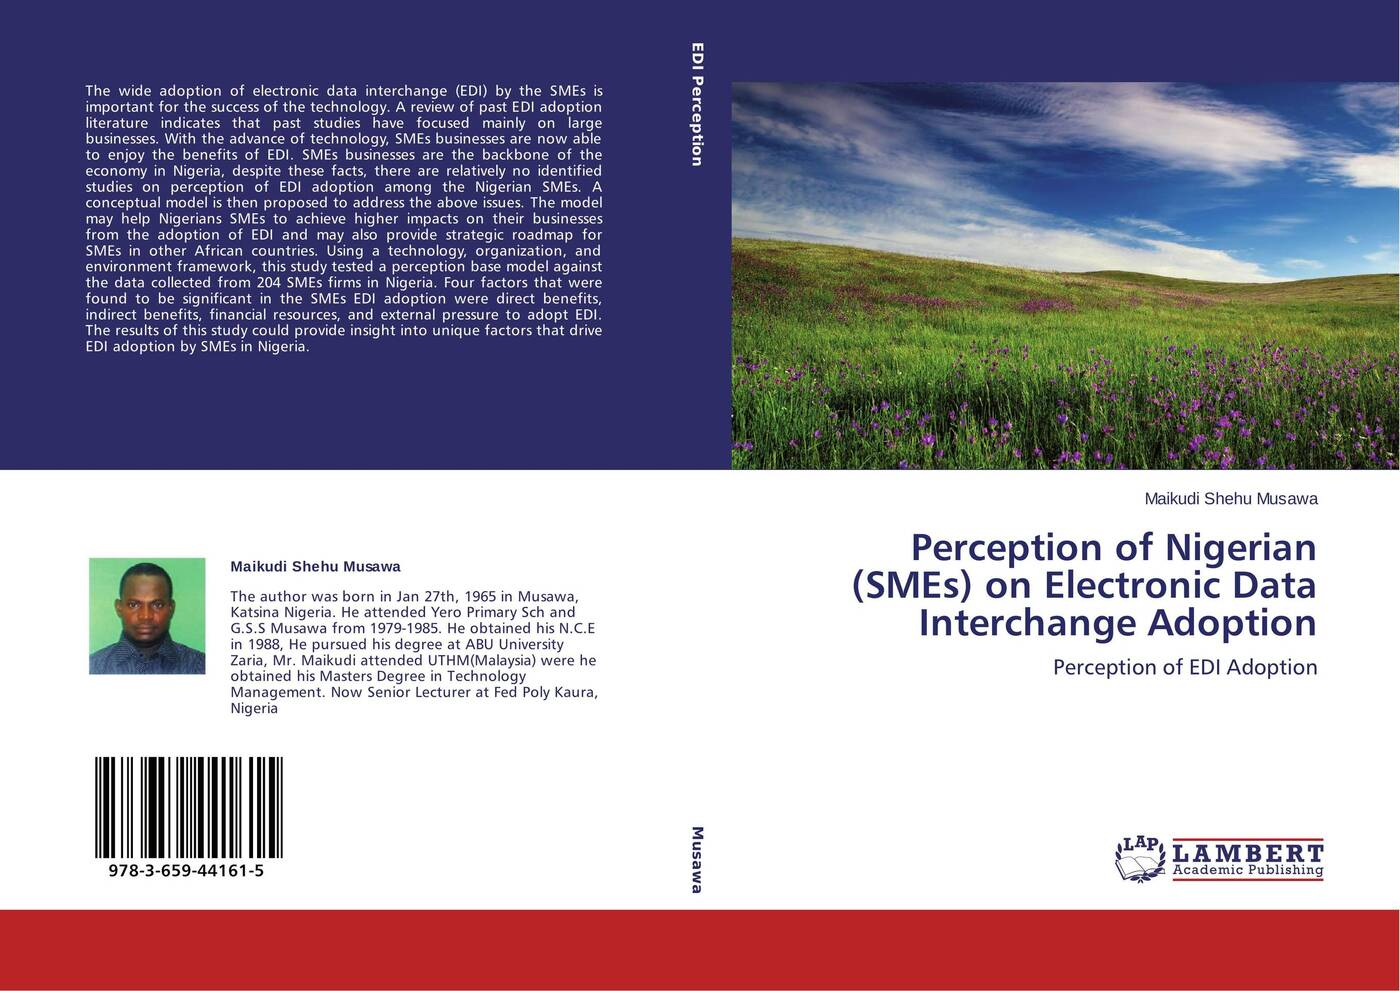 Maikudi Shehu Musawa Perception of Nigerian (SMEs) on Electronic Data Interchange Adoption whether profit is the only determinant of performance a study on smes